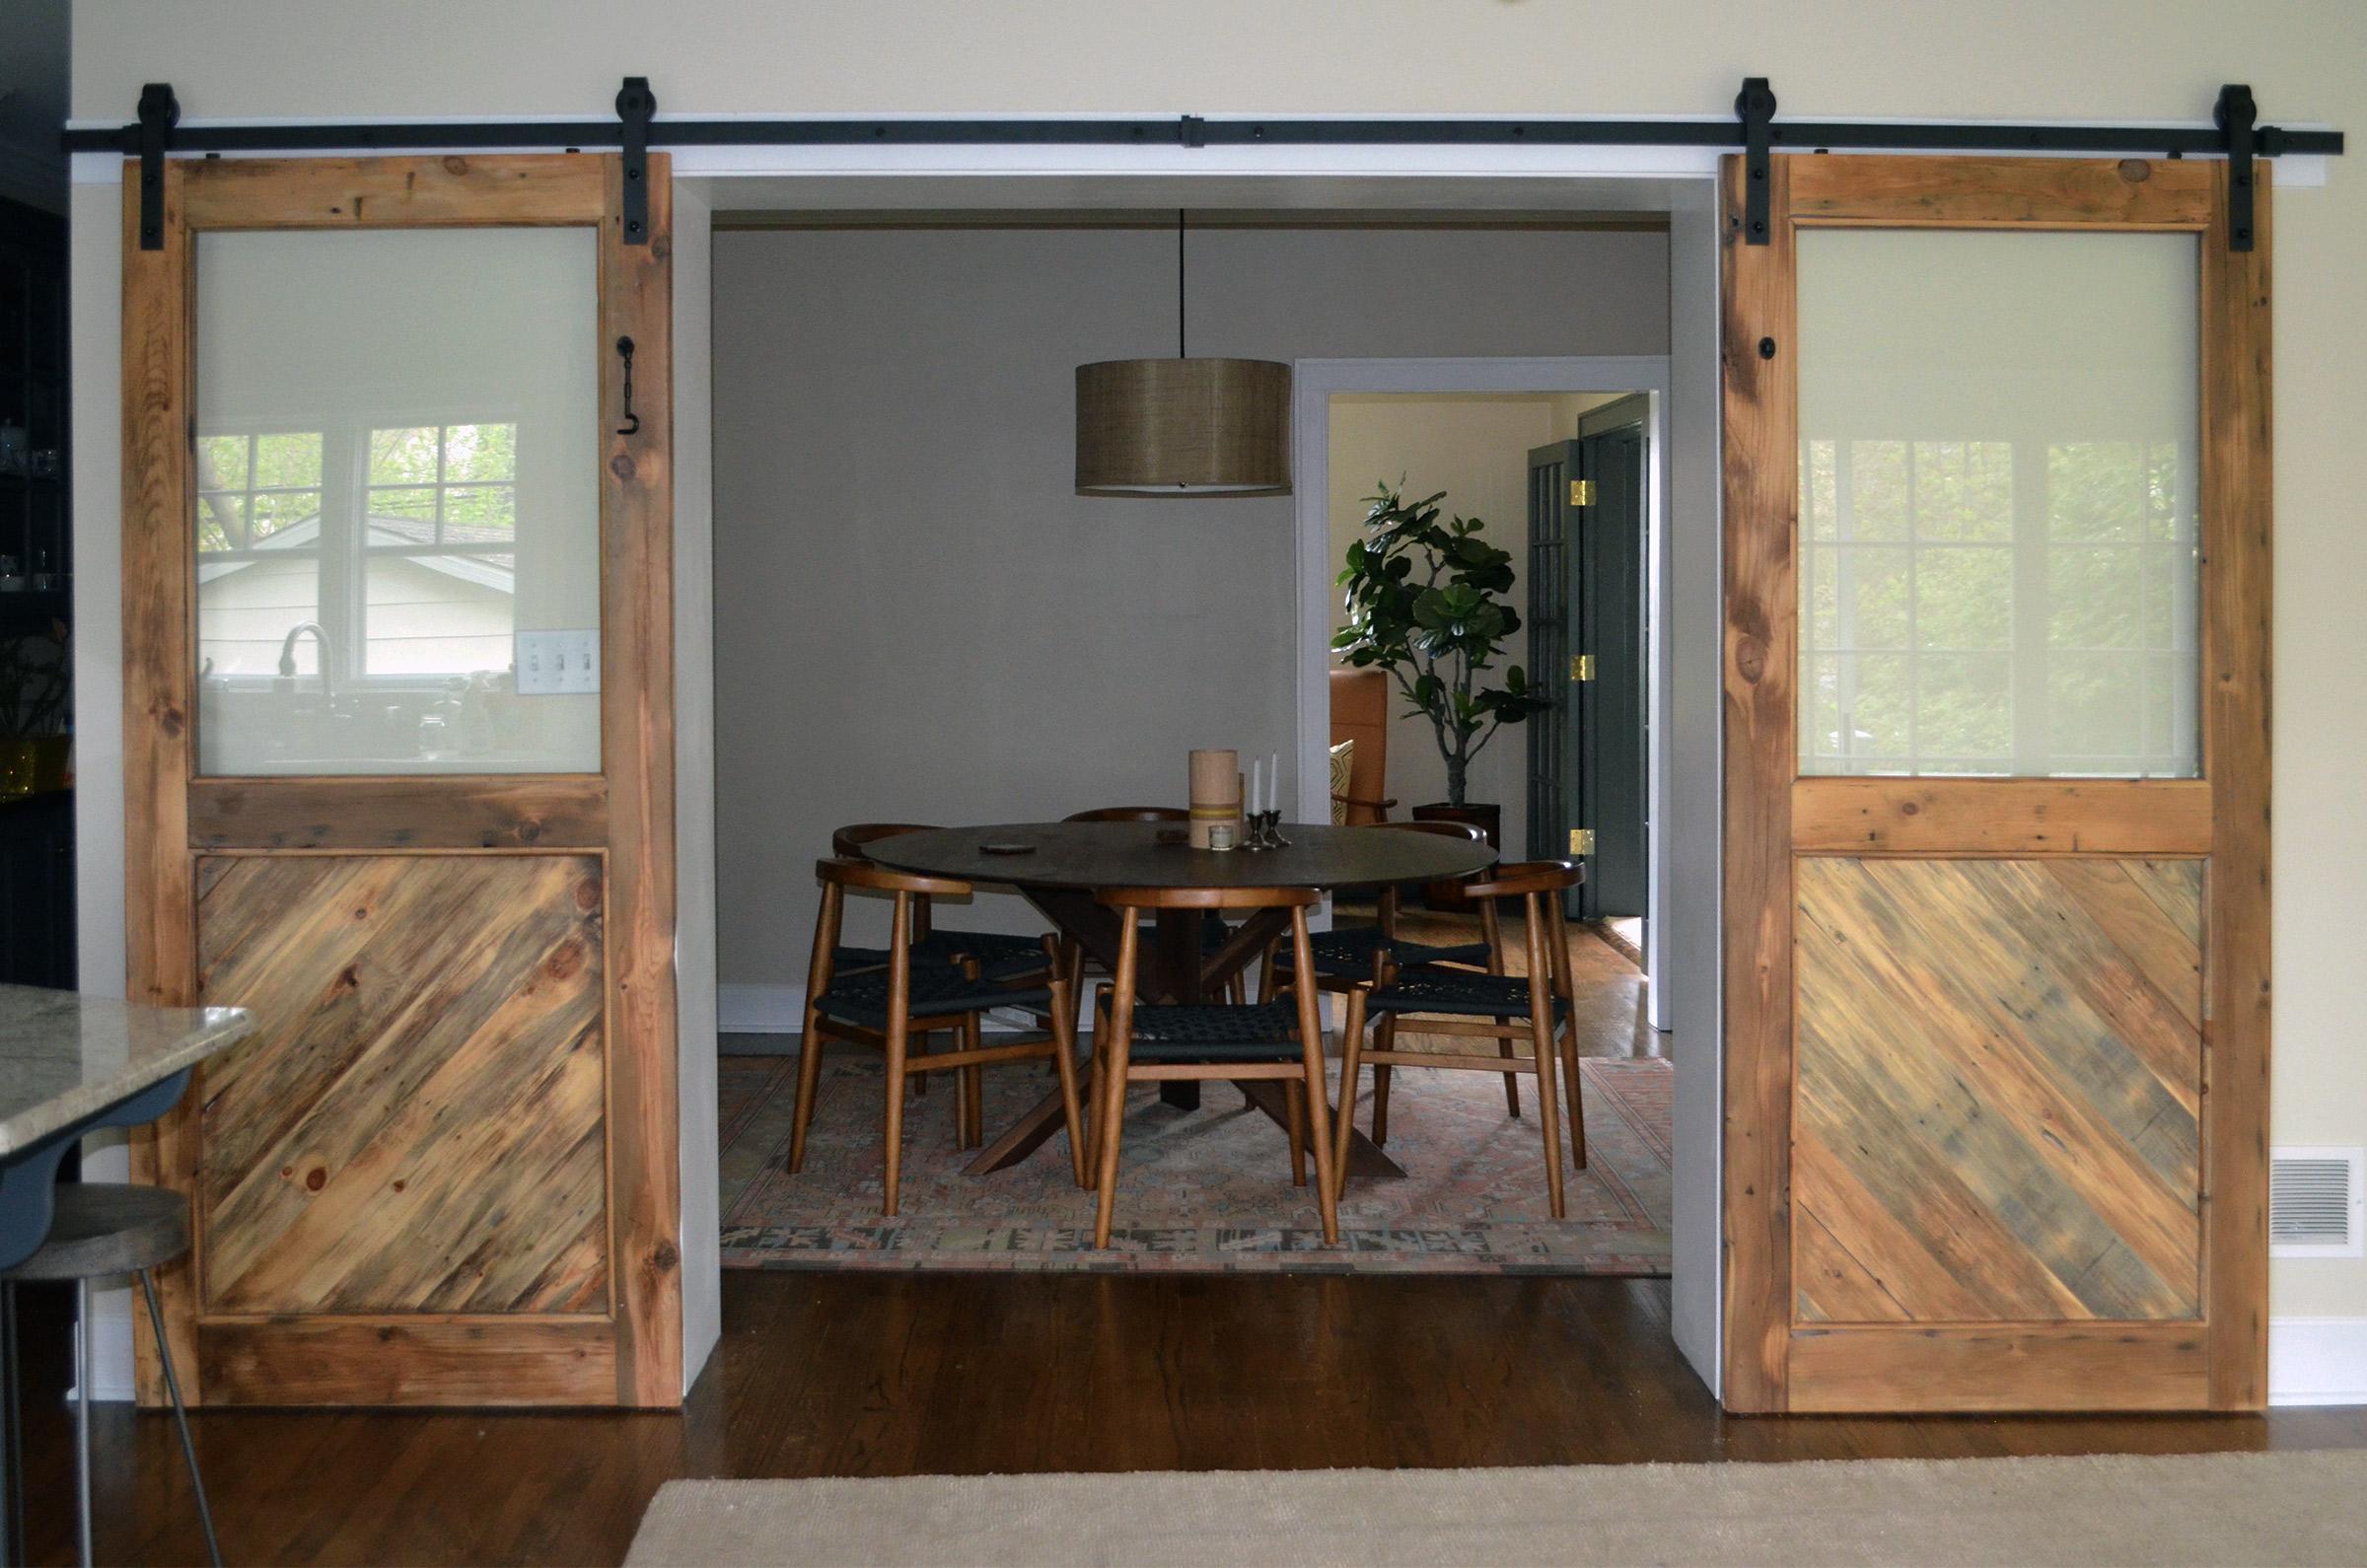 rustic sliding barn door abodeacious On rustic sliding glass doors